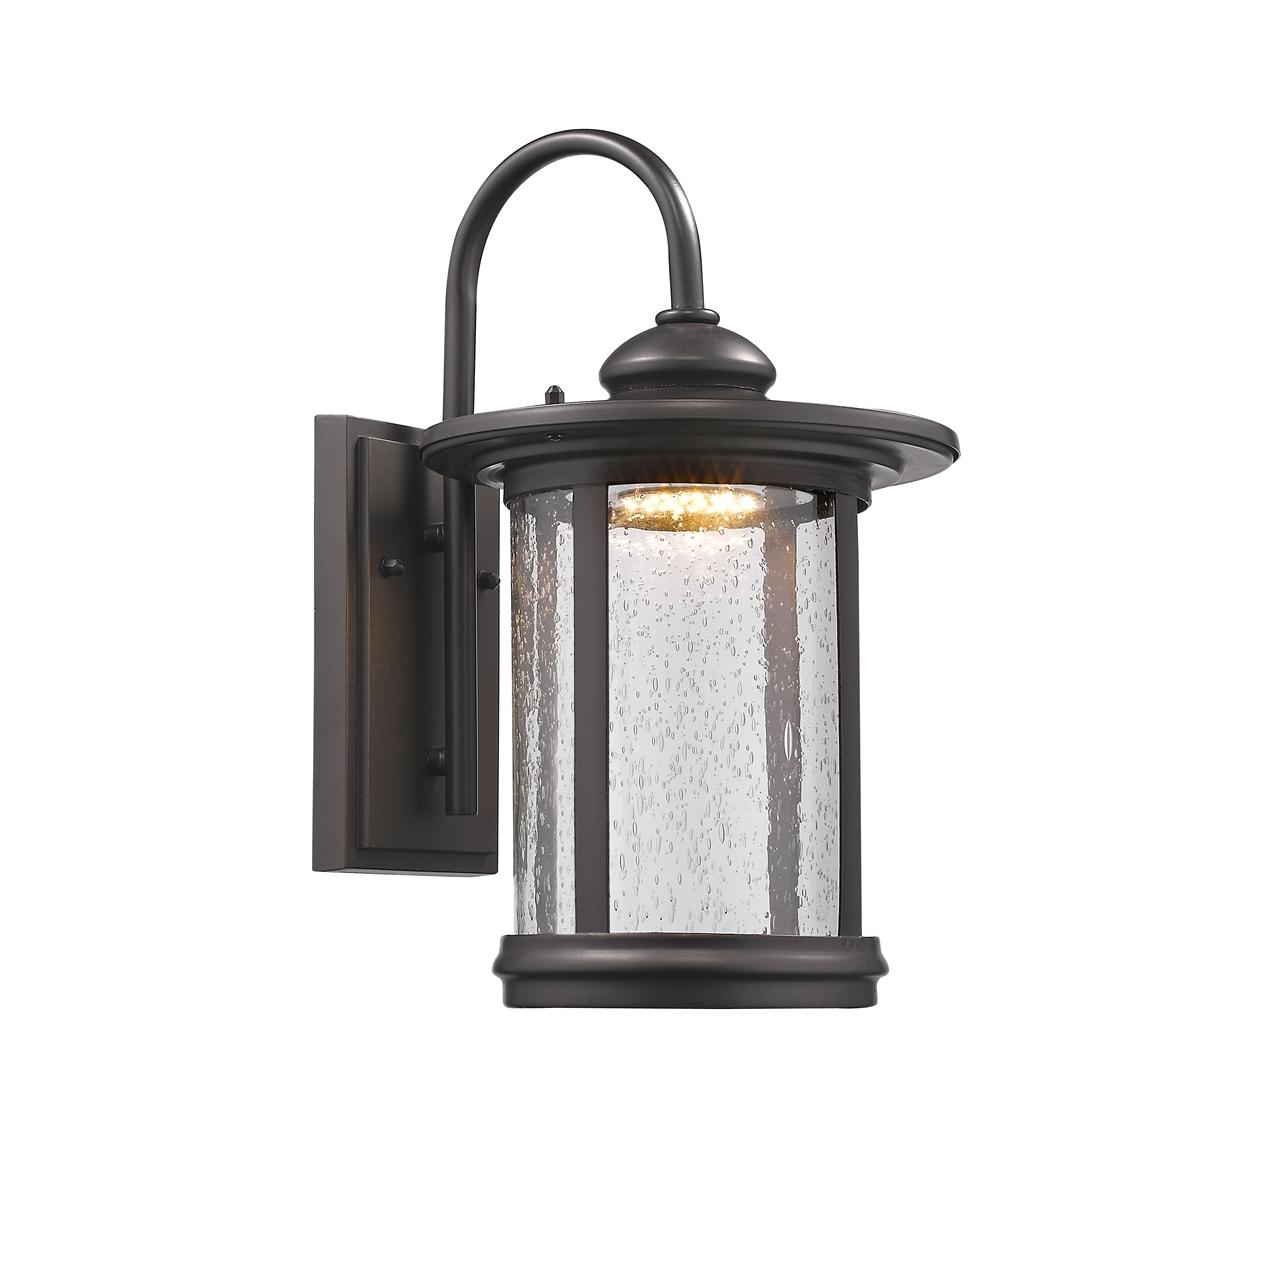 CHLOE Lighting, Inc Lighting wholesale, Lighting ... on Sconce Outdoor Lighting id=18222